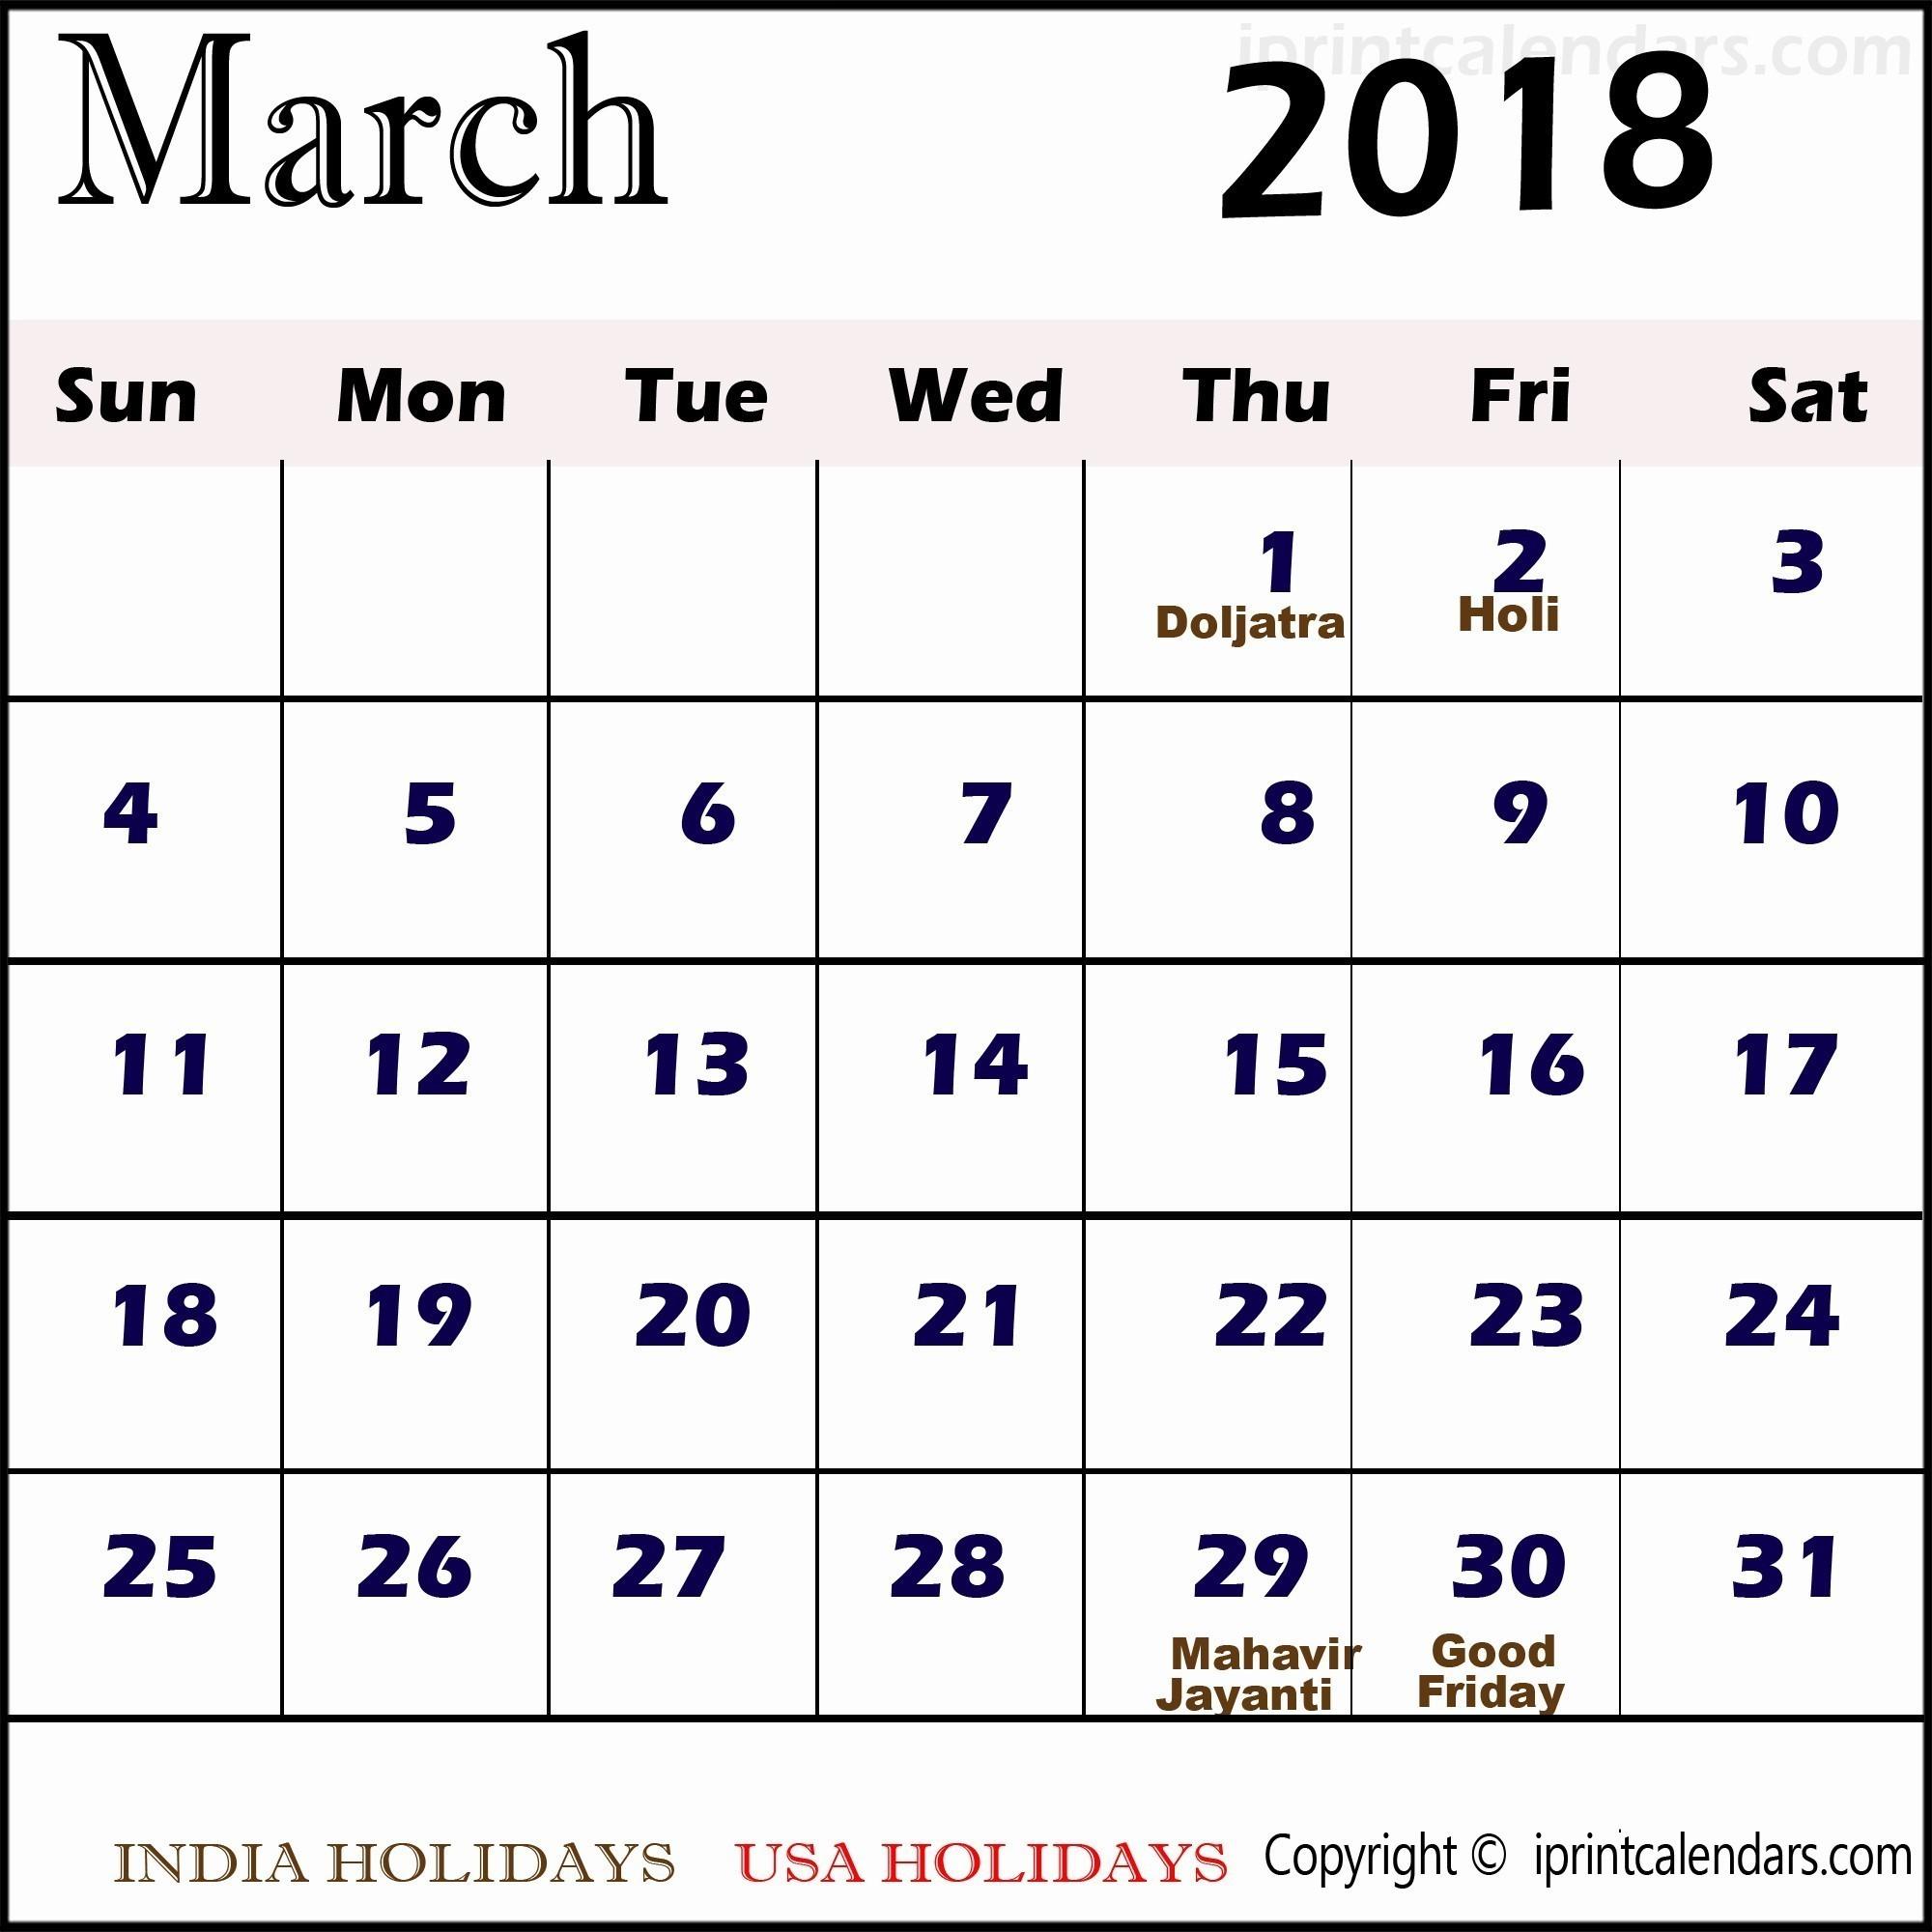 March Calendar 2019 Más Recientes Knowledge Regarding Printable Calendar for 2019 with Holidays Of March Calendar 2019 Mejores Y Más Novedosos 30 Day Calendar Template Awesome Calendar 1 April 2018 to 31 March